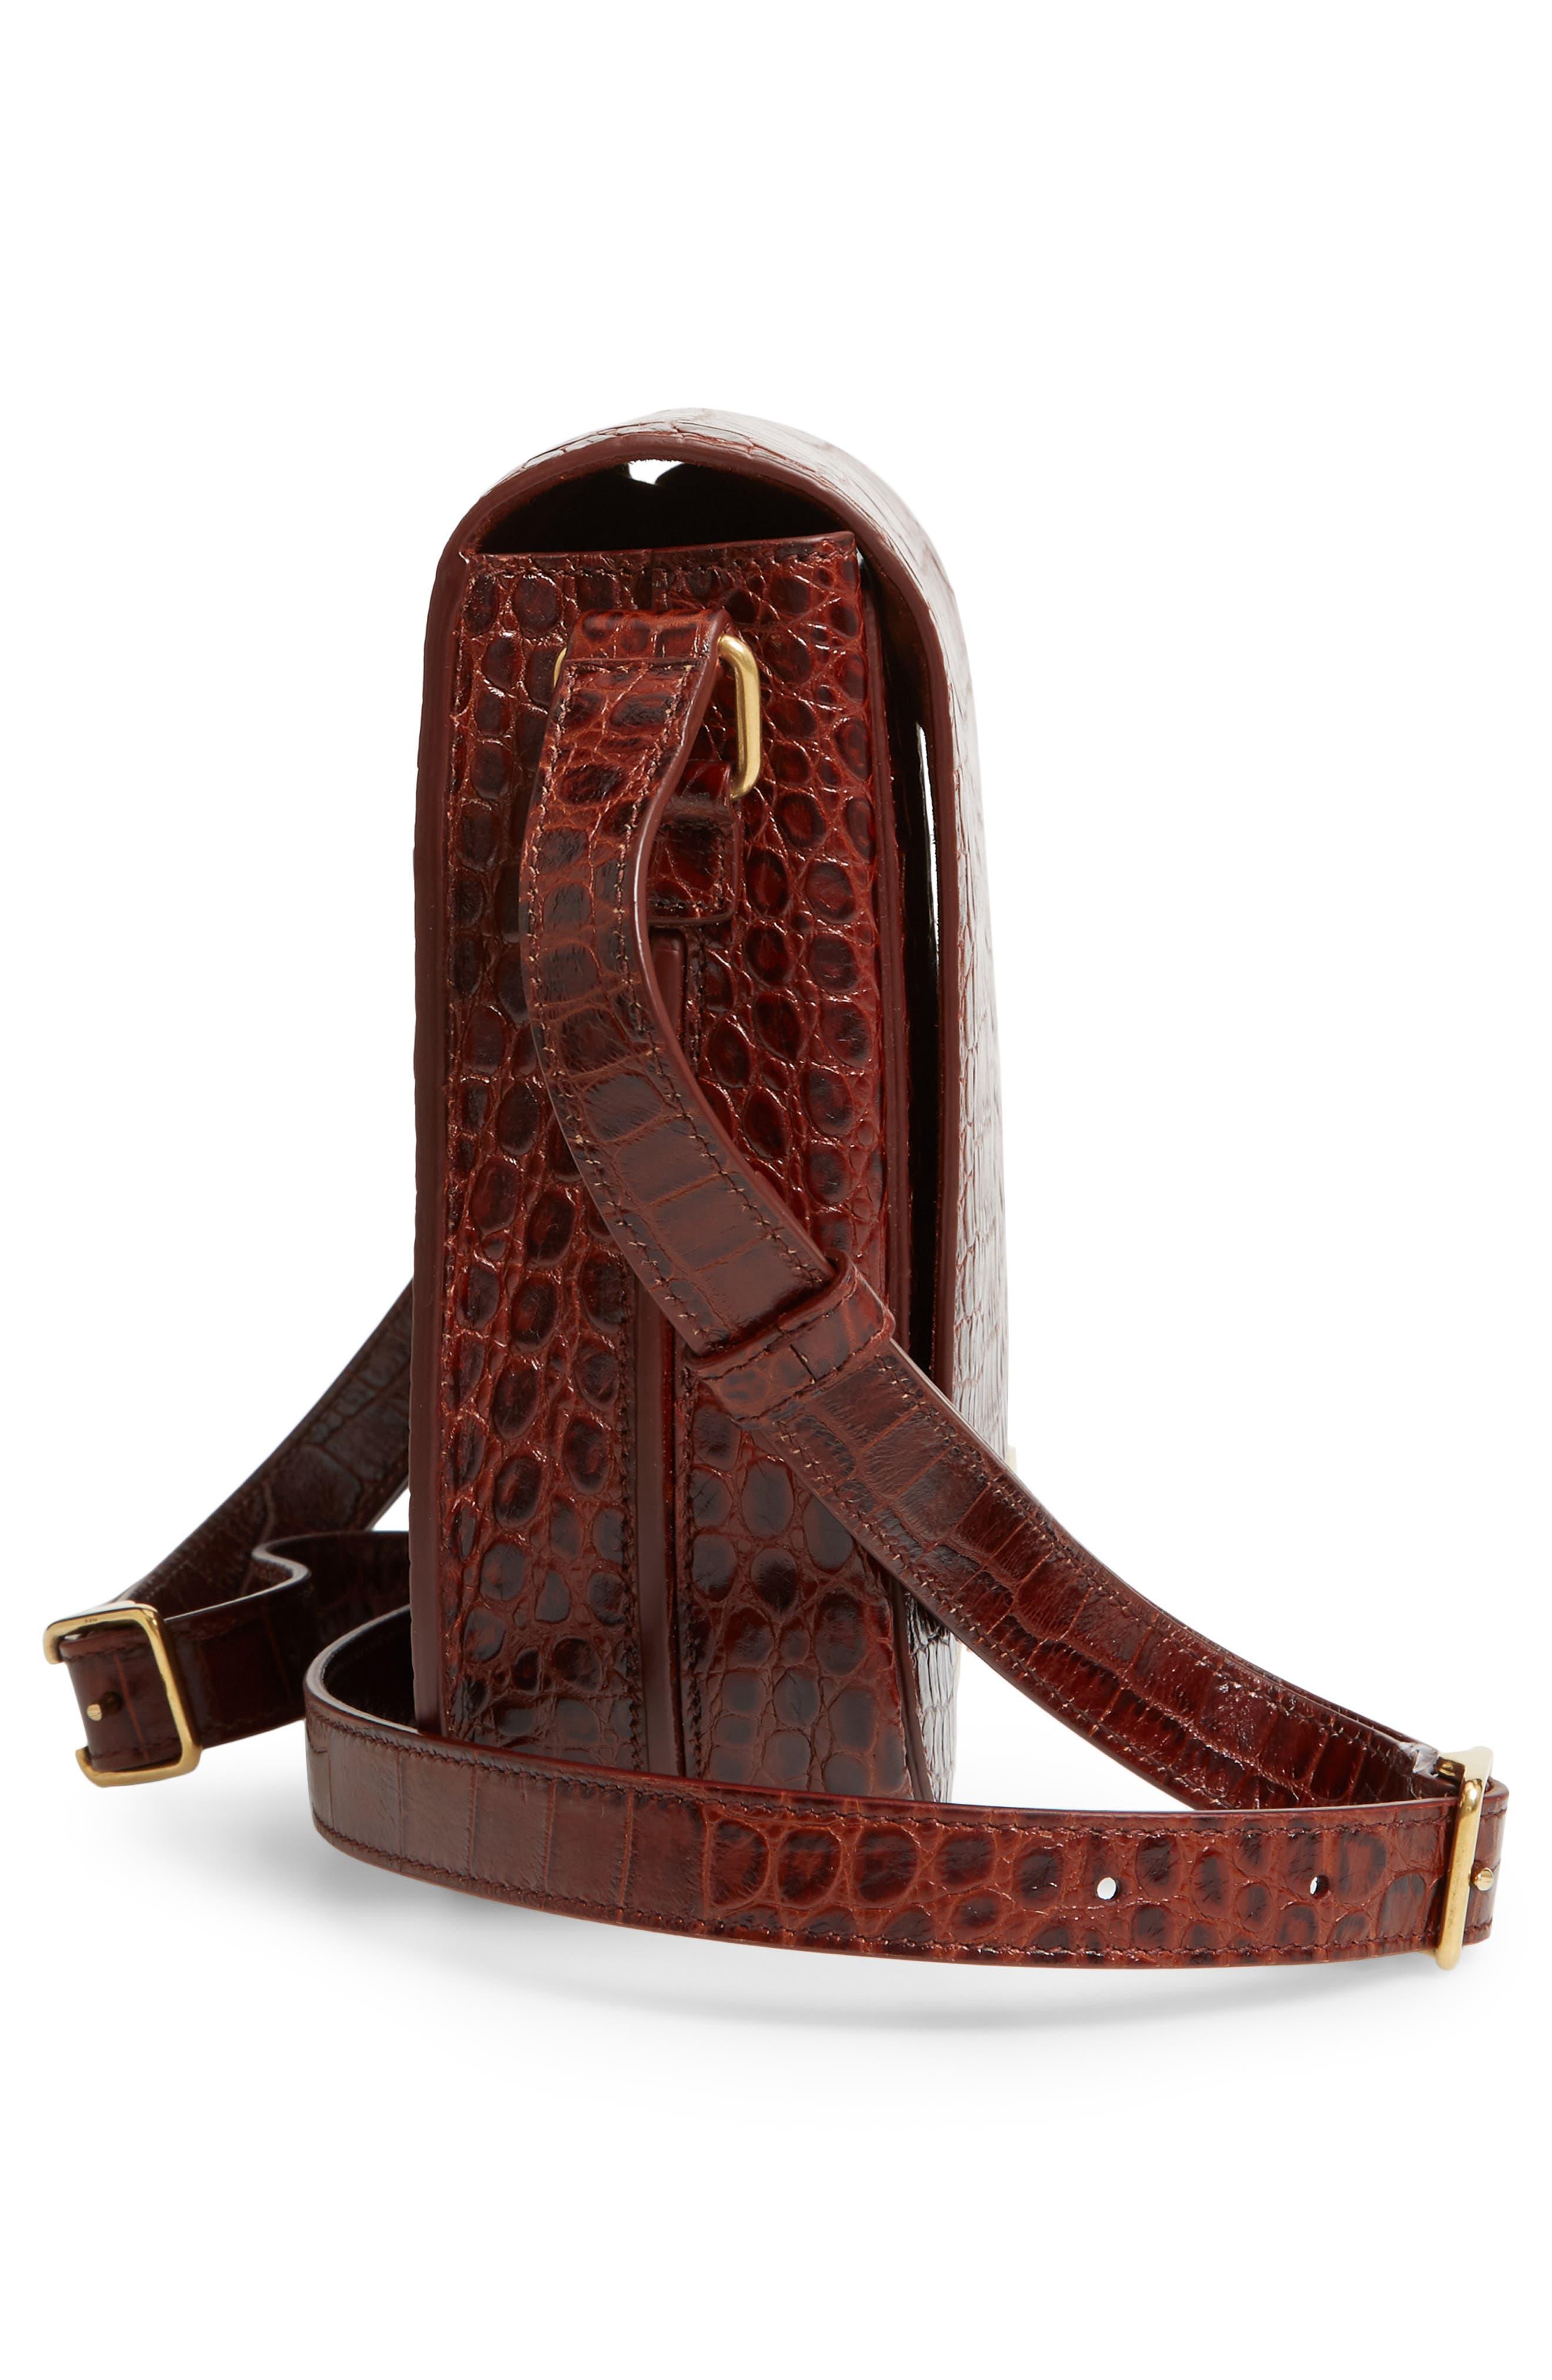 Betty Croc Embossed Leather Shoulder Bag,                             Alternate thumbnail 5, color,                             DARK BLOOD